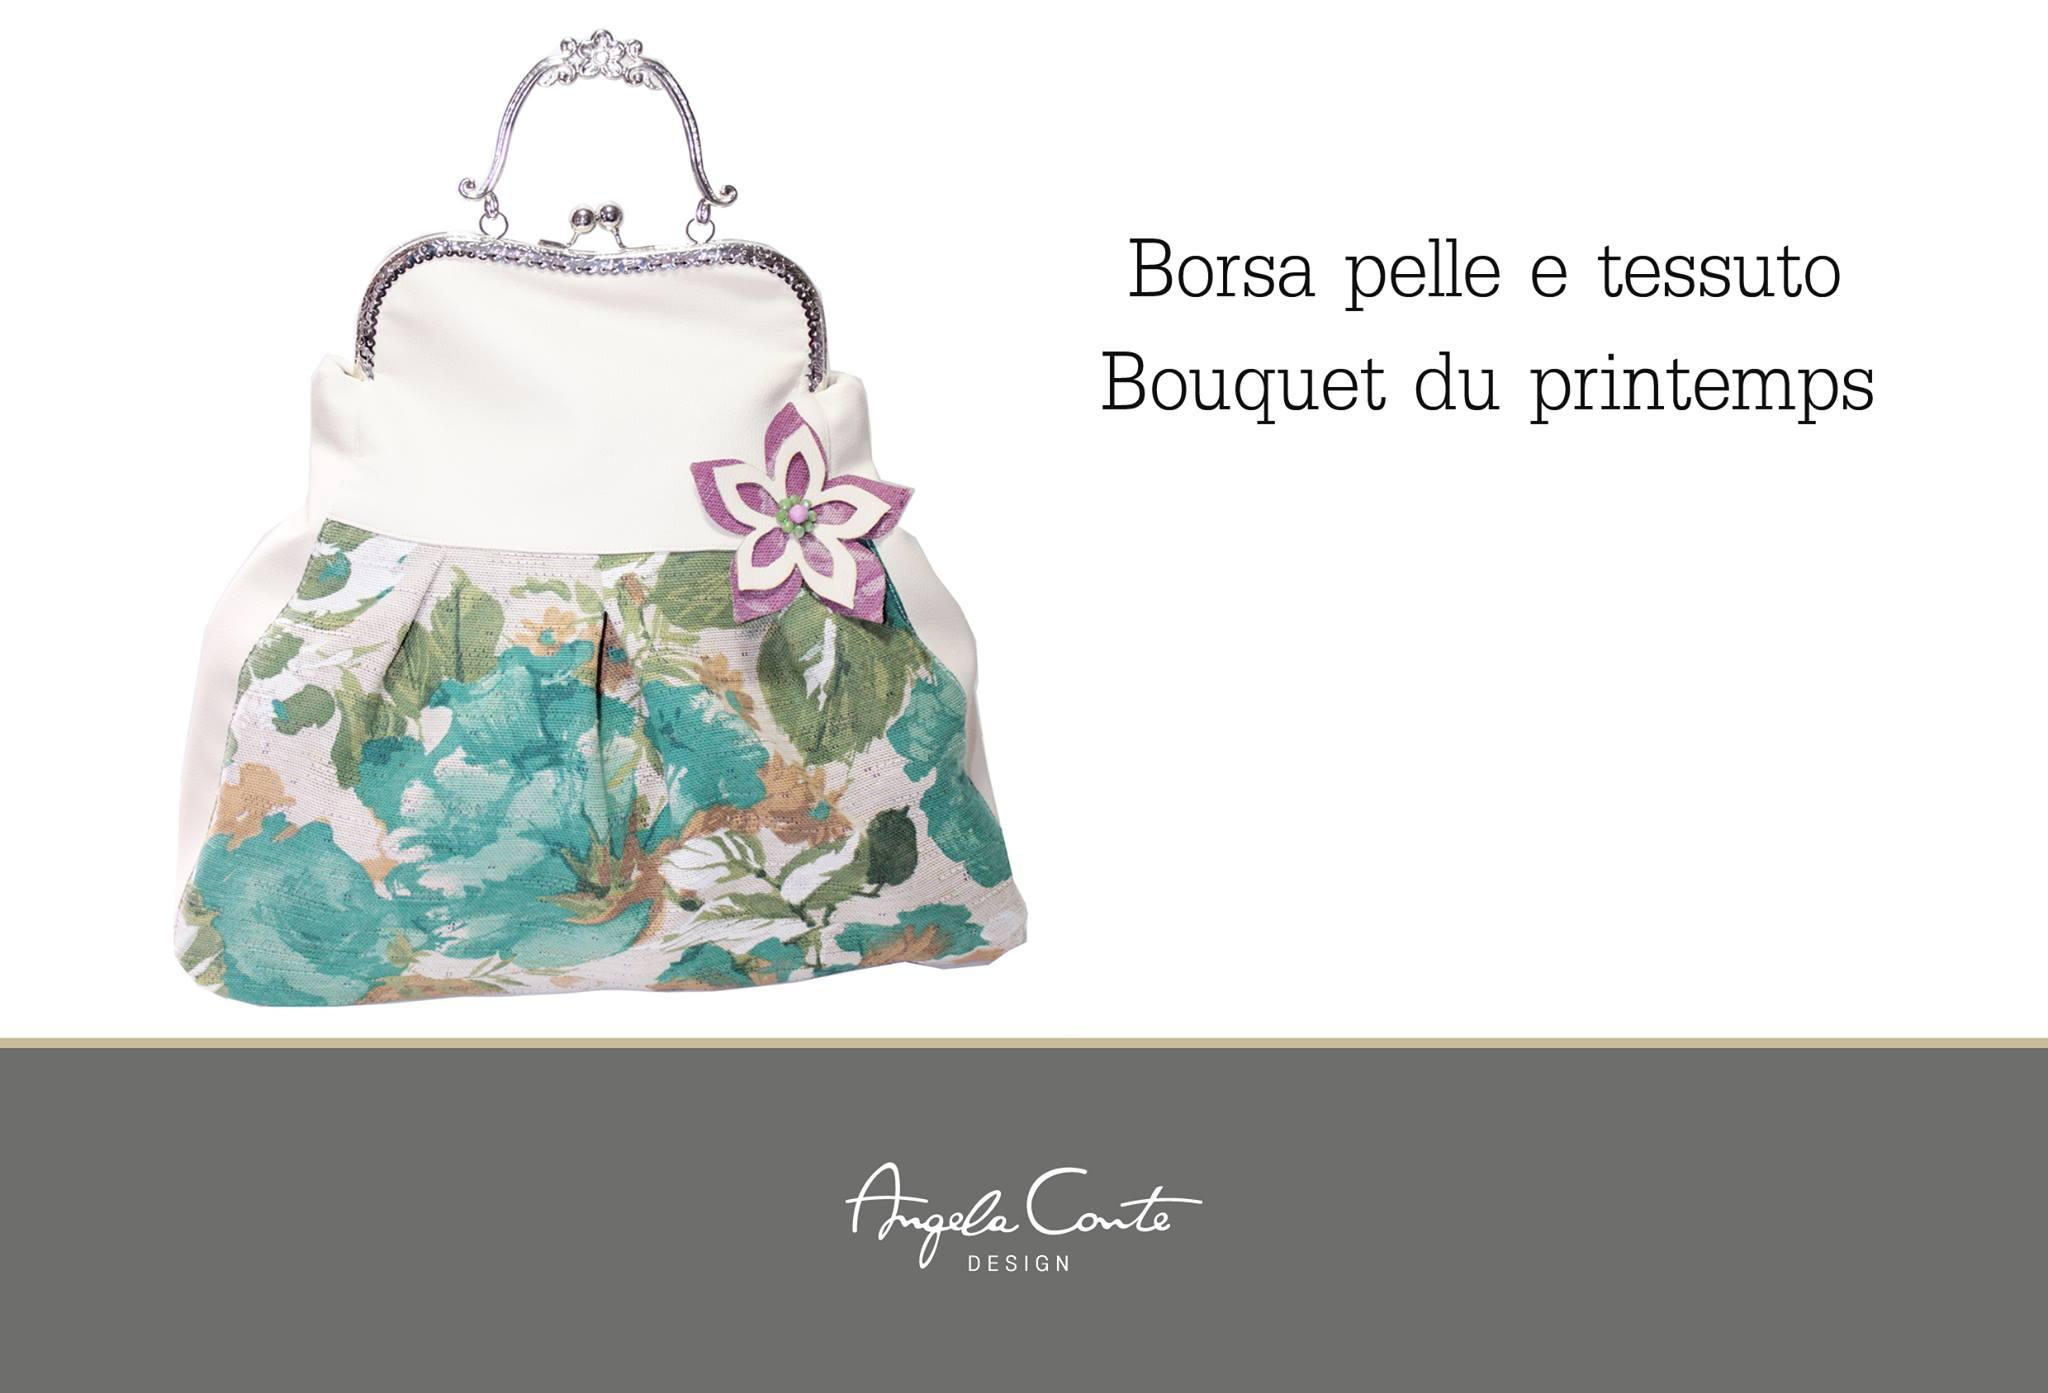 Angela Conte Design